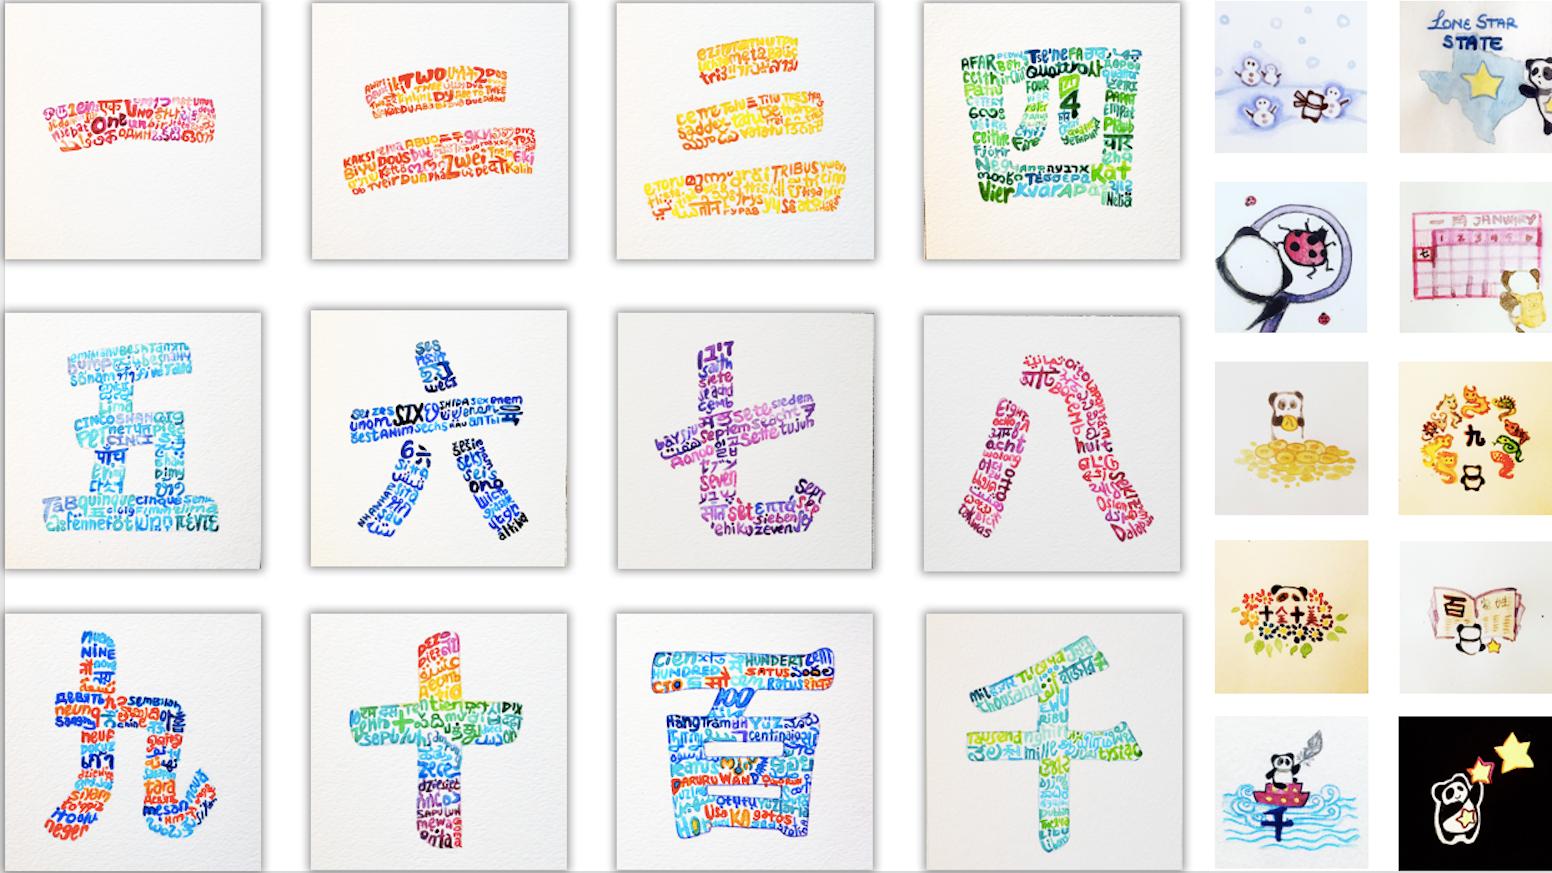 Make 100 chinese character paintings e book audiobook by linda multilingualism through art teaching chinese characters one painting at a timepainting updates buycottarizona Choice Image